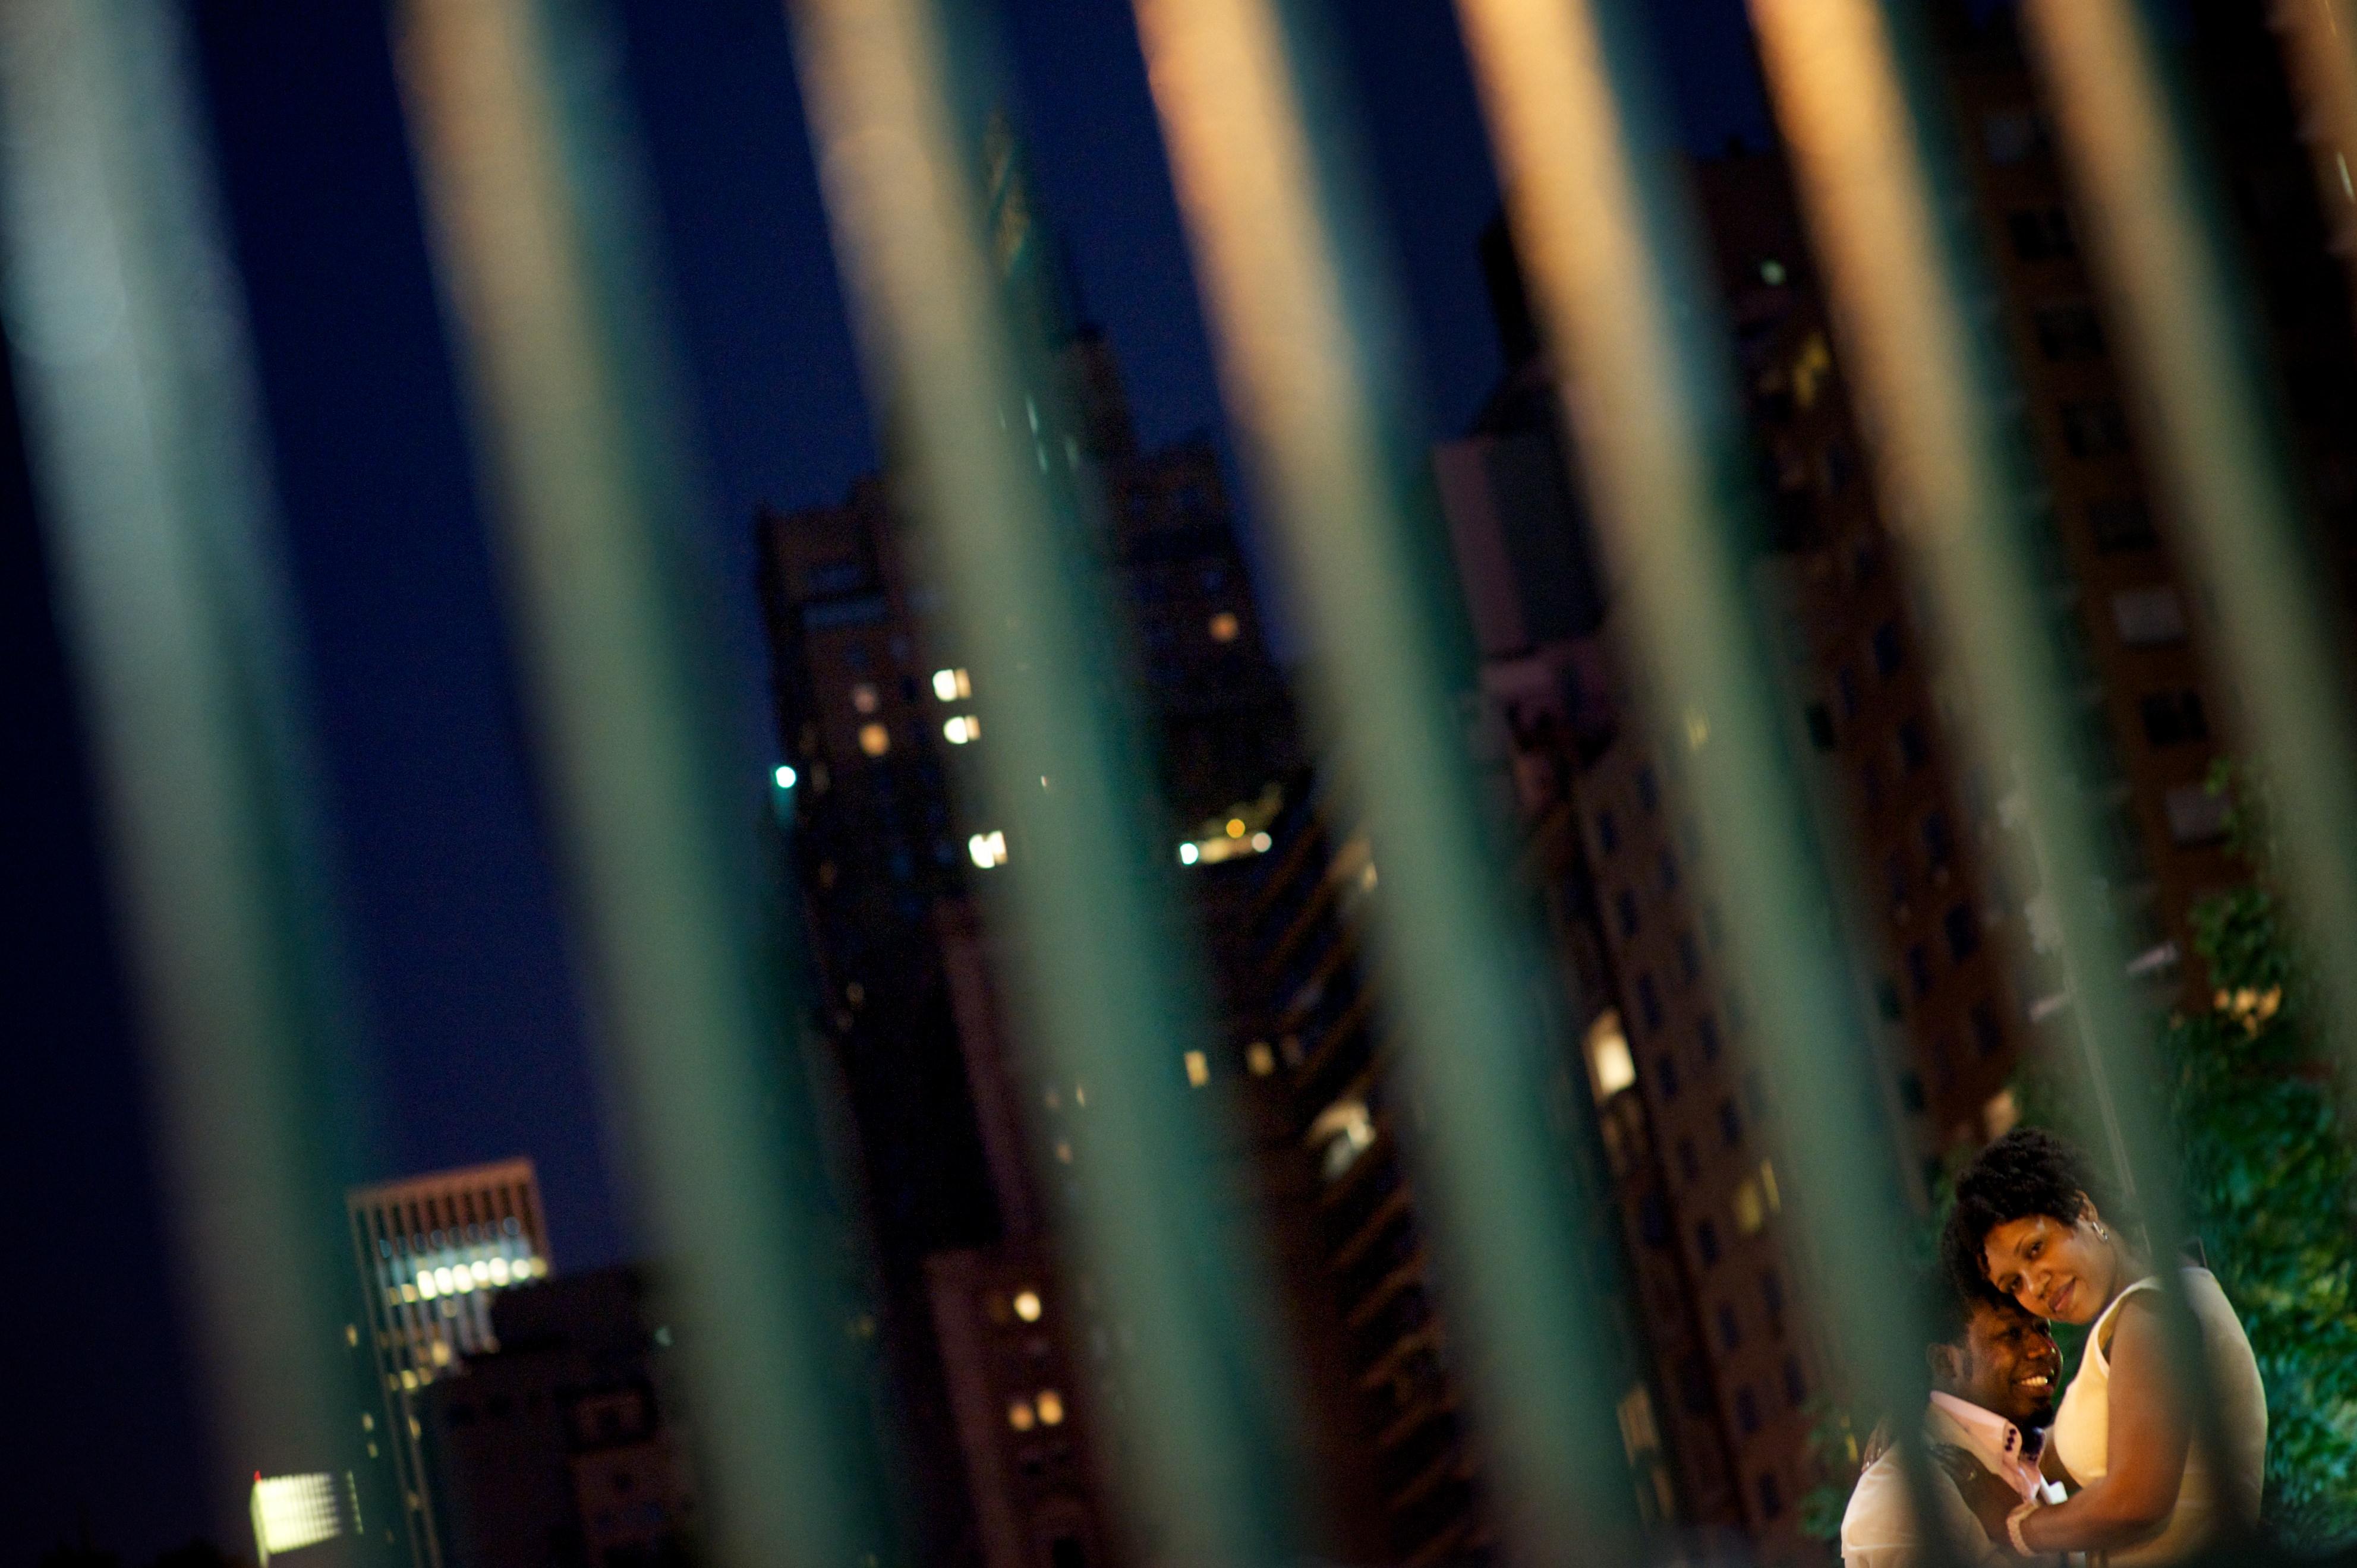 betty-garnel-009-central-park-new-york-city-ny-engagement-photographer-joshua-dwain-20110527_bg_072